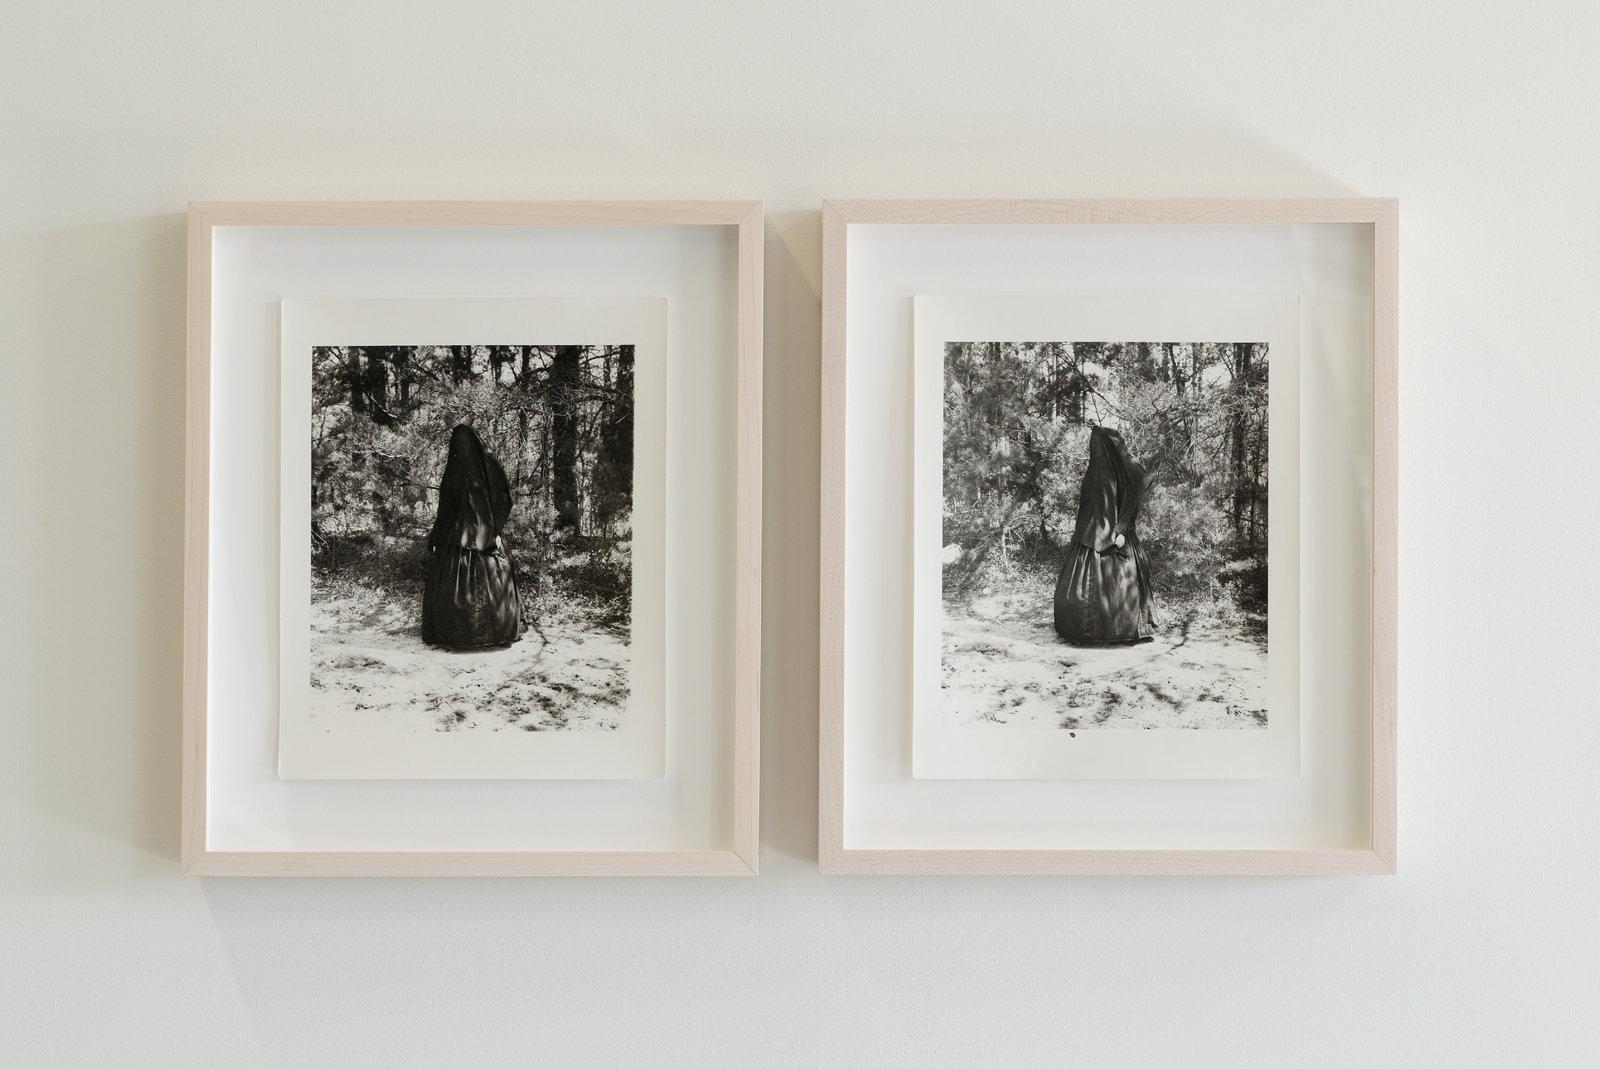 Liz Magor, Civil War Widows, 1991, 2 selenium tinted silver gelatine prints, each 8 x 10 in. (21 x 25 cm) by Liz Magor